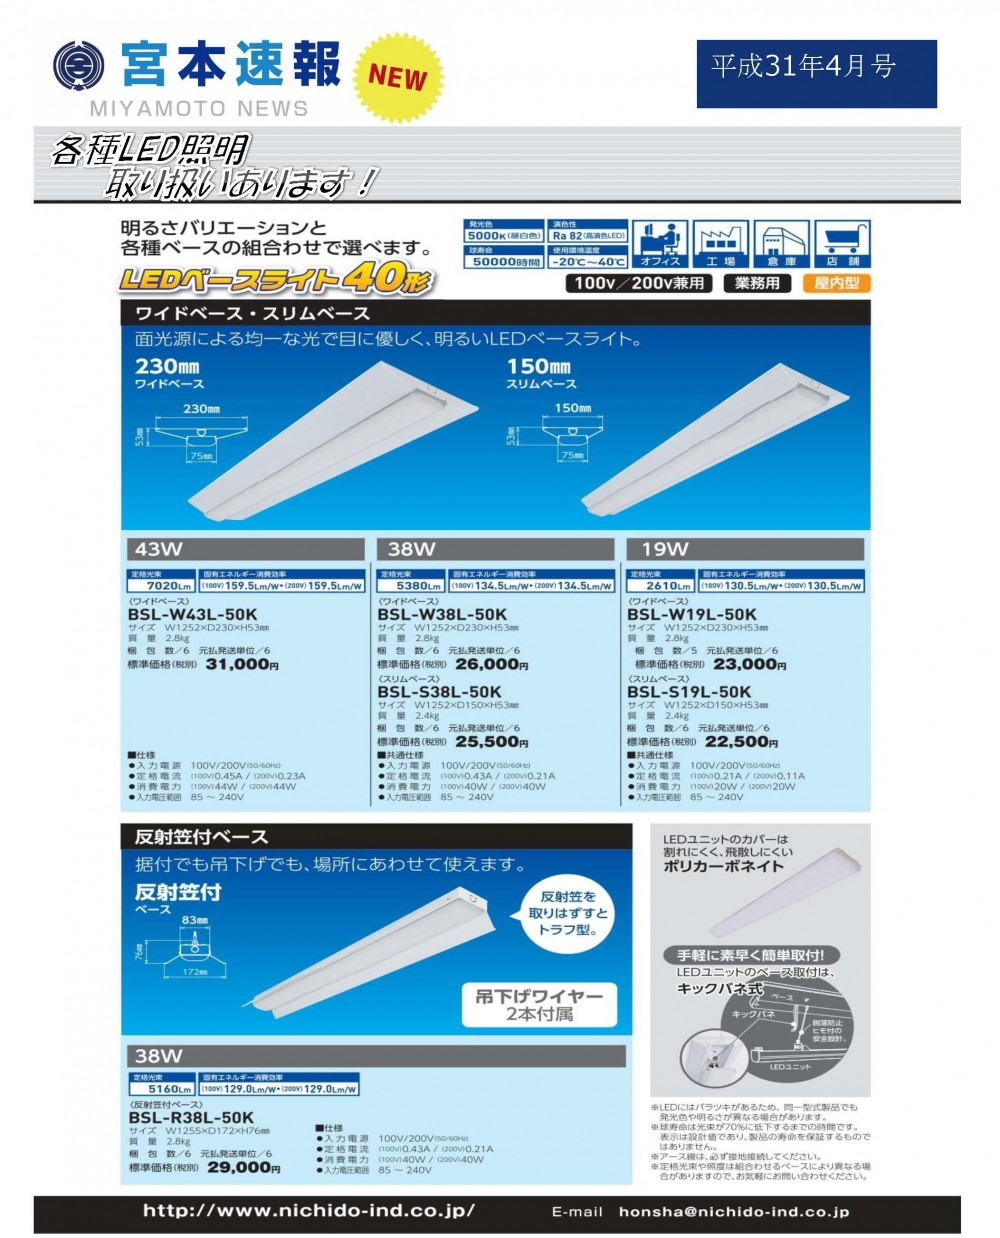 190401miyamoto001-1